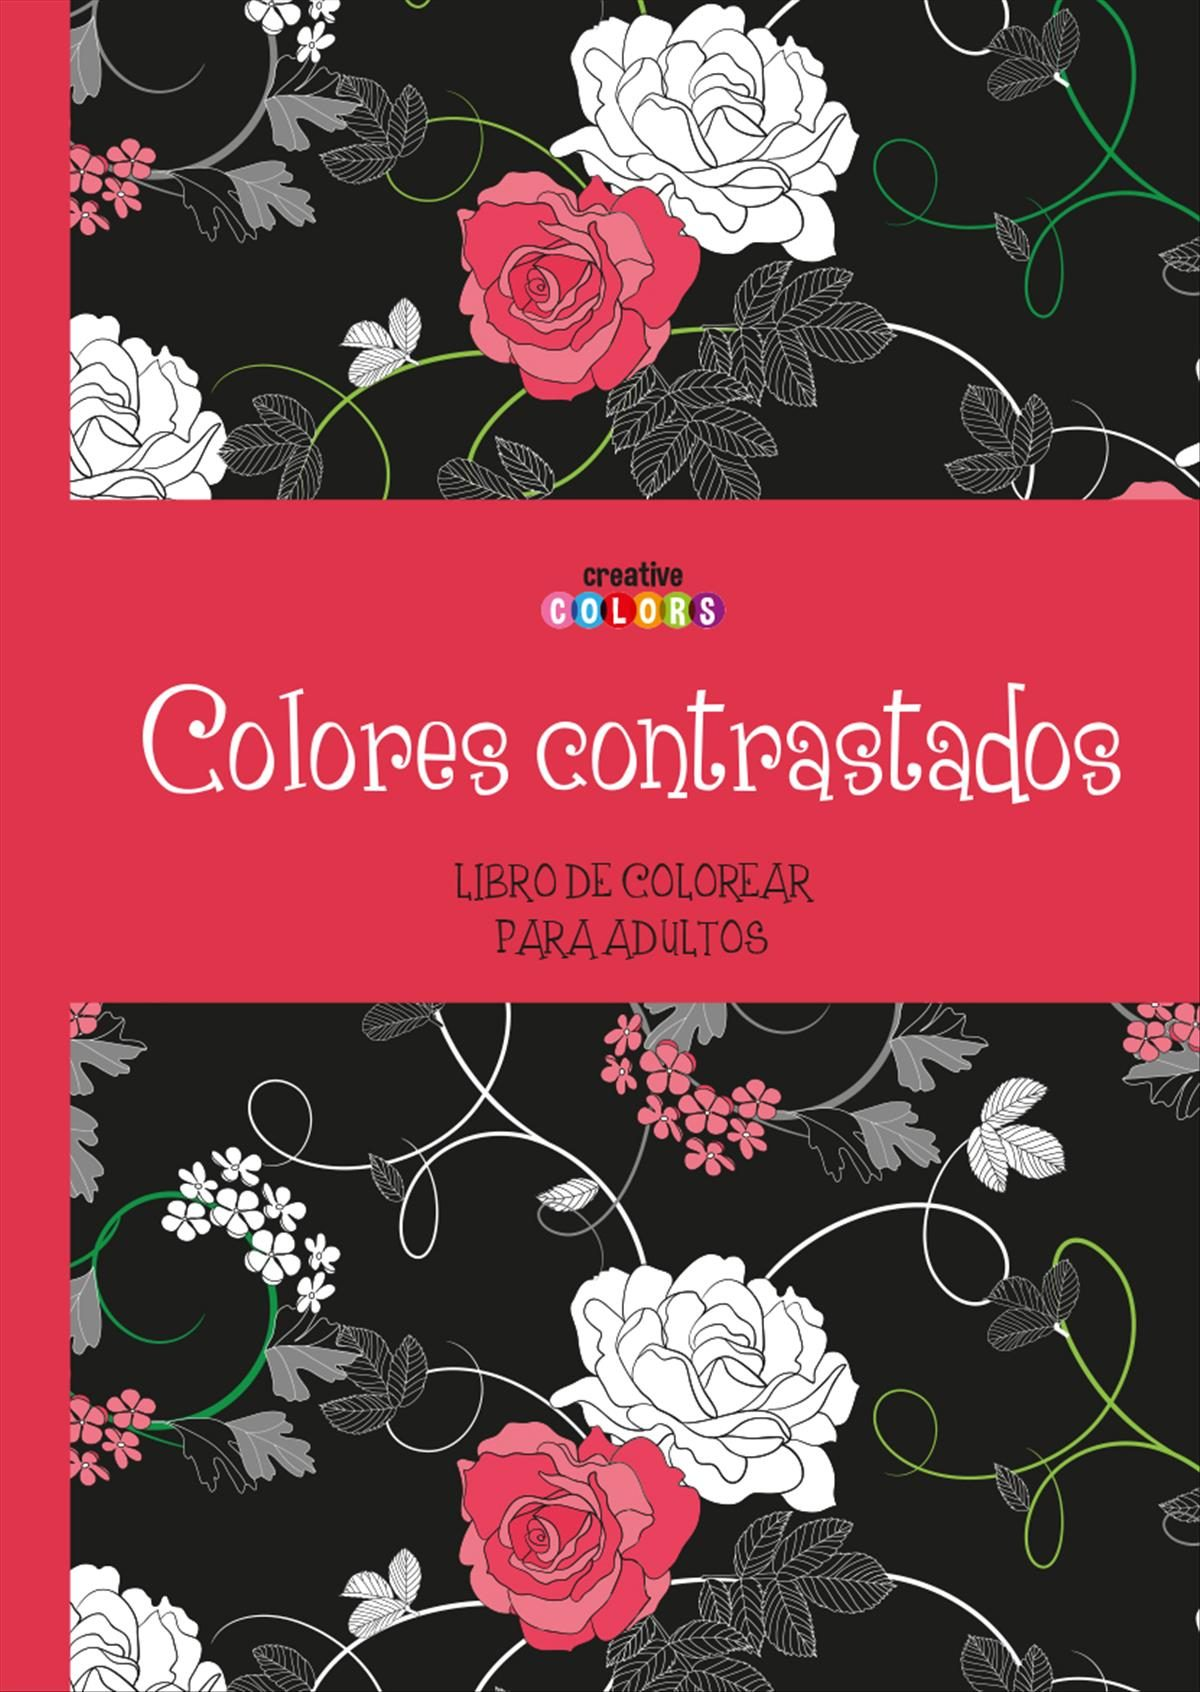 COLORES CONTRASTADOS. COLOREAR PARA ADULTOS | VV.AA. | Comprar libro ...